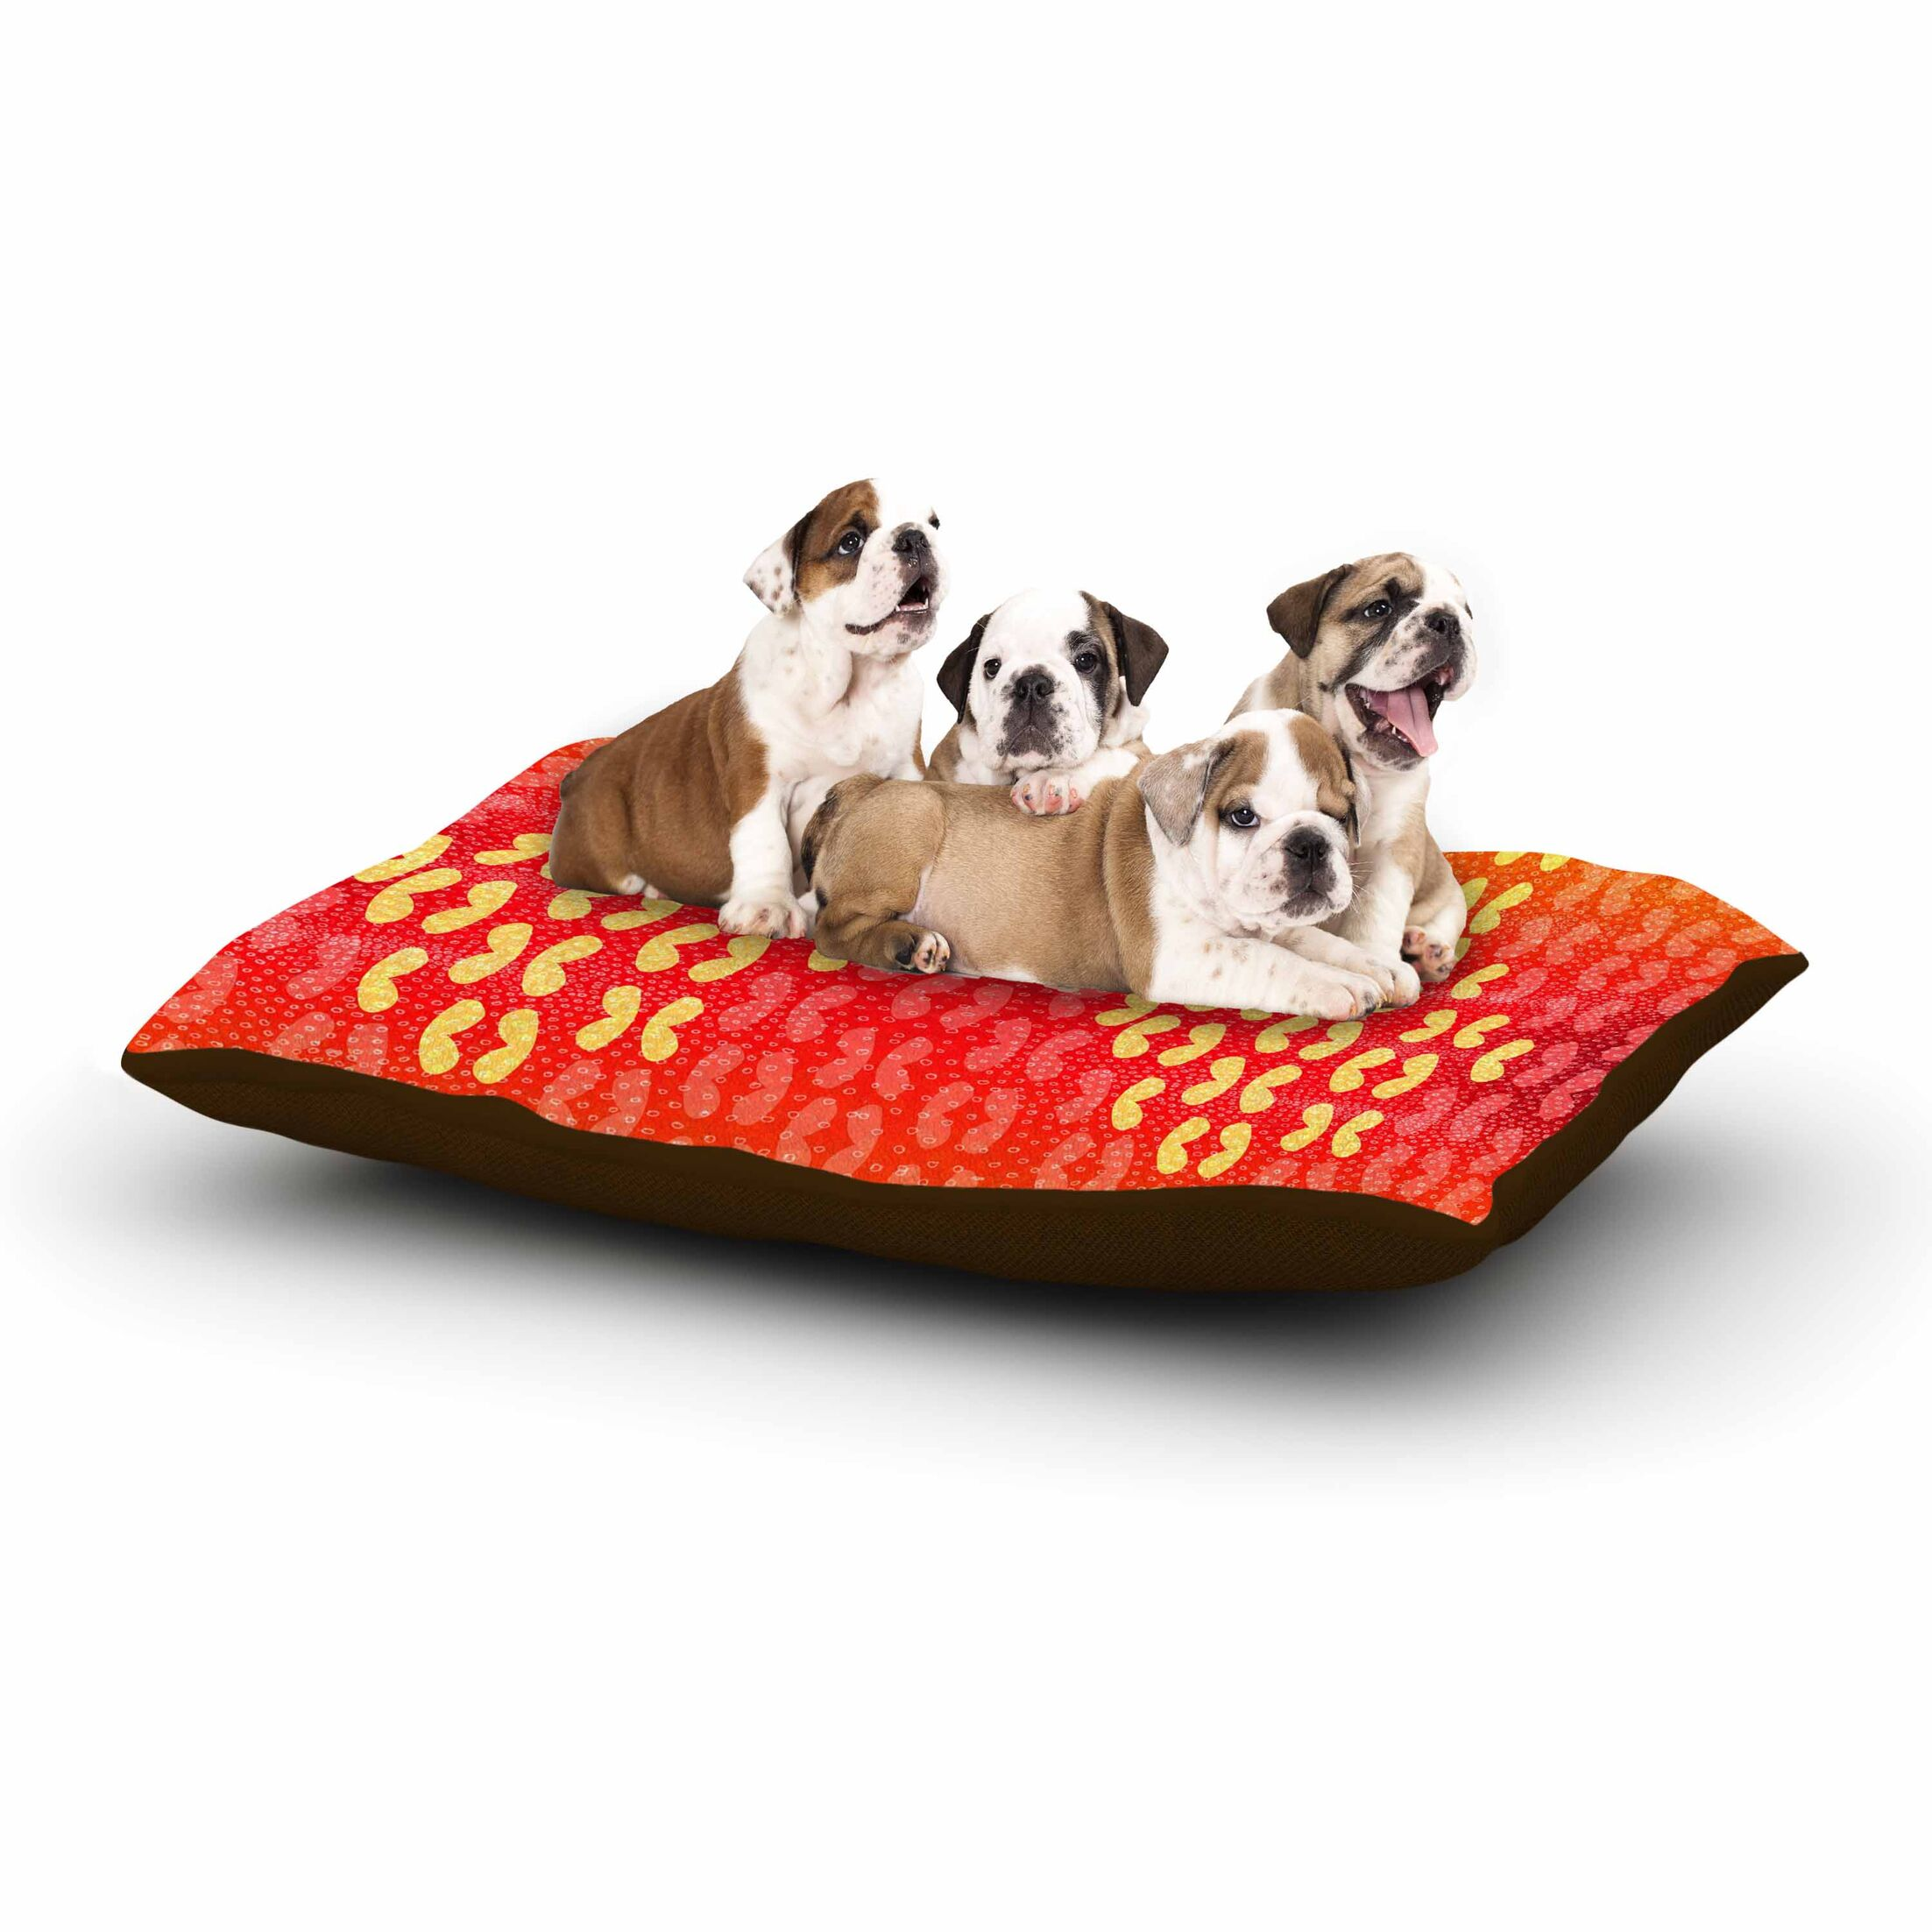 Dan Sekanwagi 'Butterfly Elements' Dog Pillow with Fleece Cozy Top